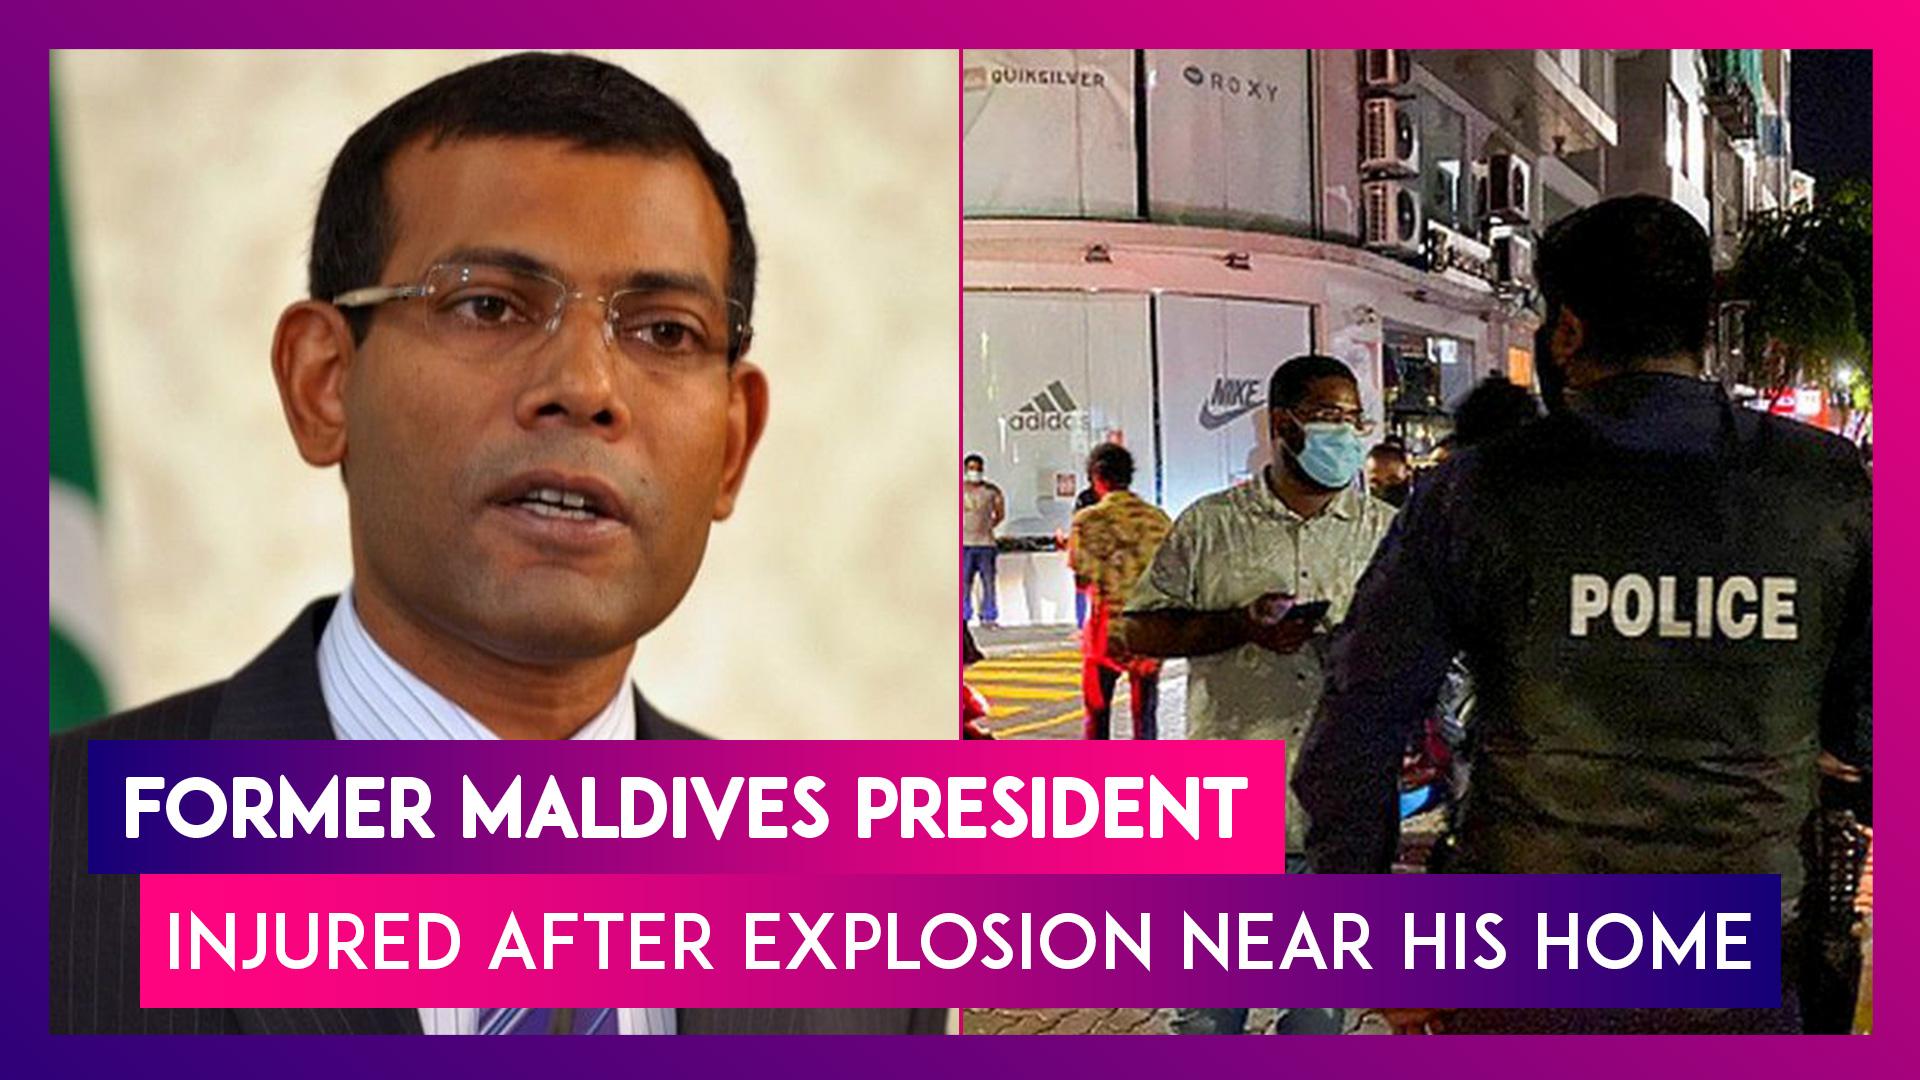 Maldives: Mohamed Nasheed, Former President Injured After Explosion Near Residence